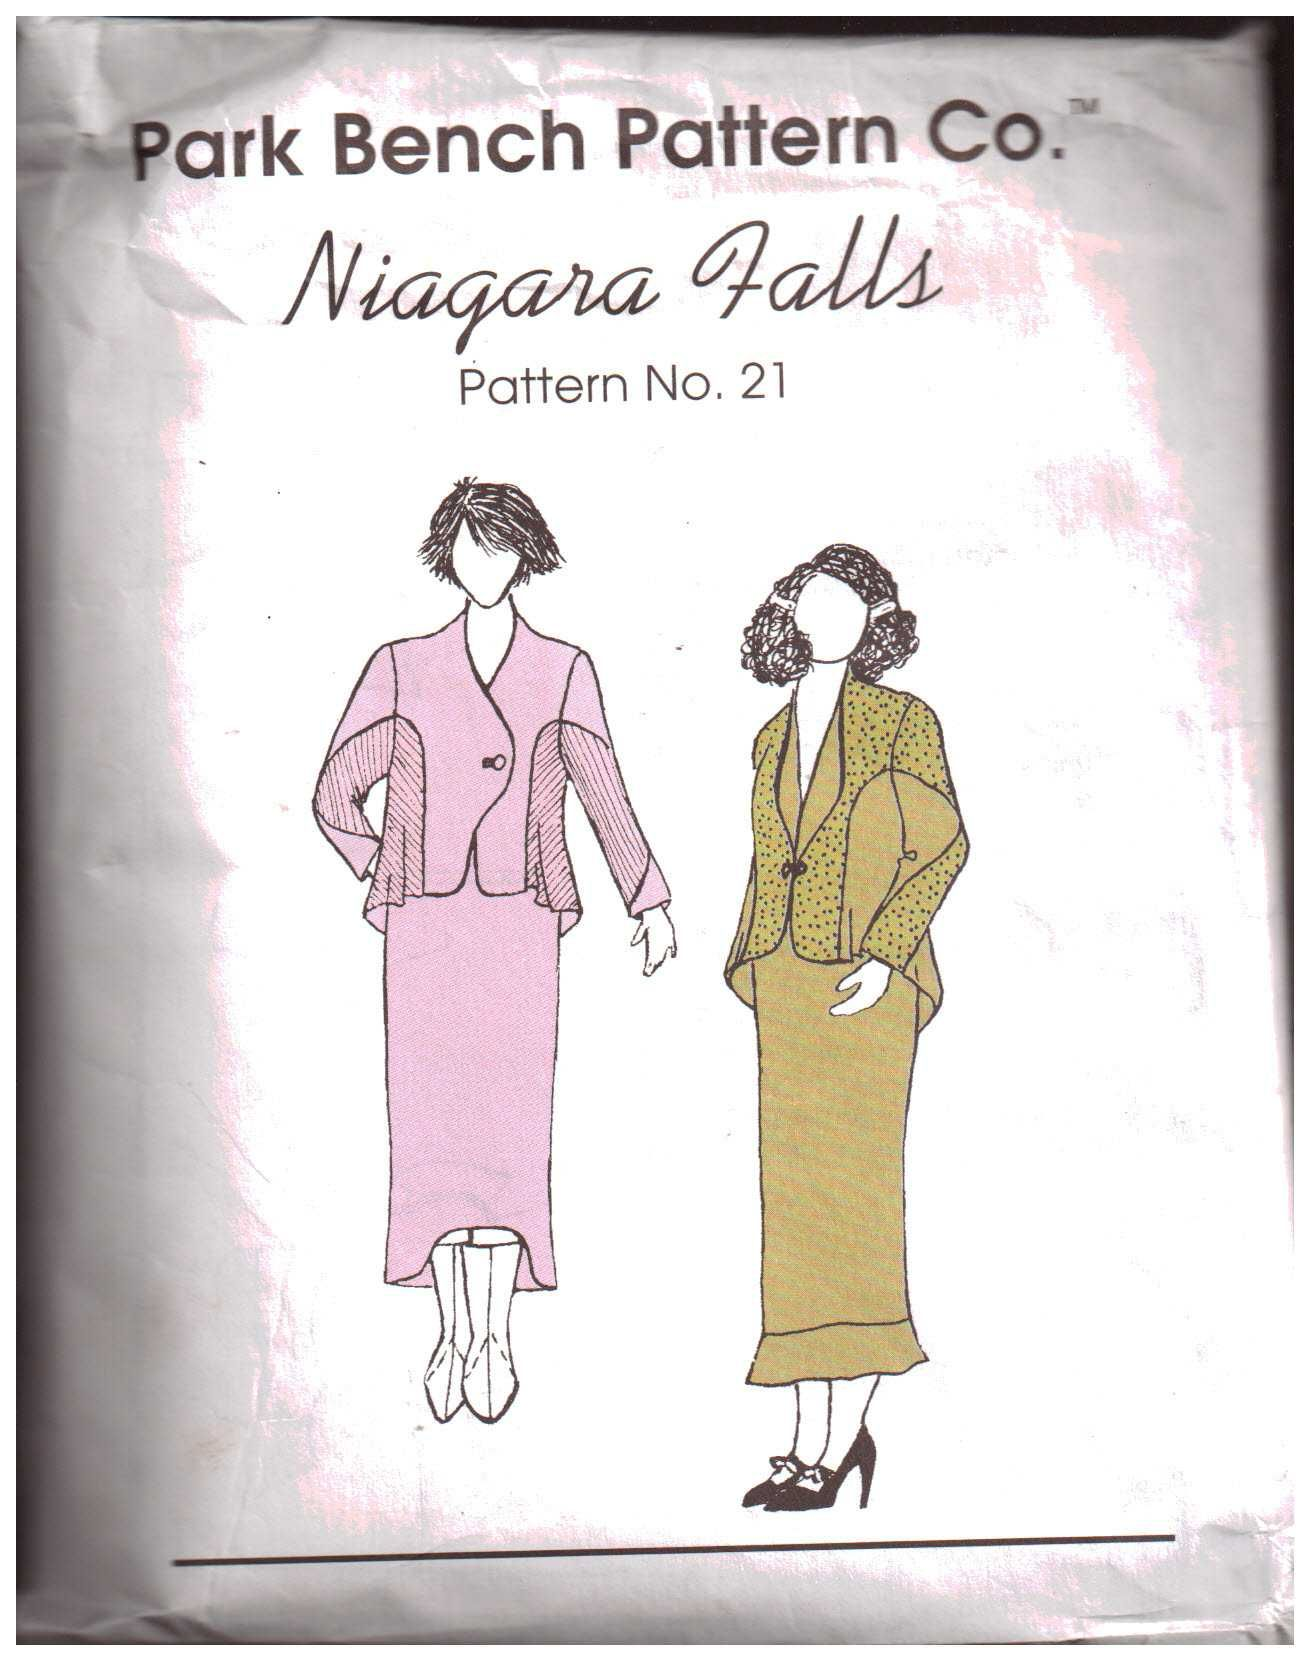 Park Bench Pattern Company 21 Niagara Falls Top Skirt Size All